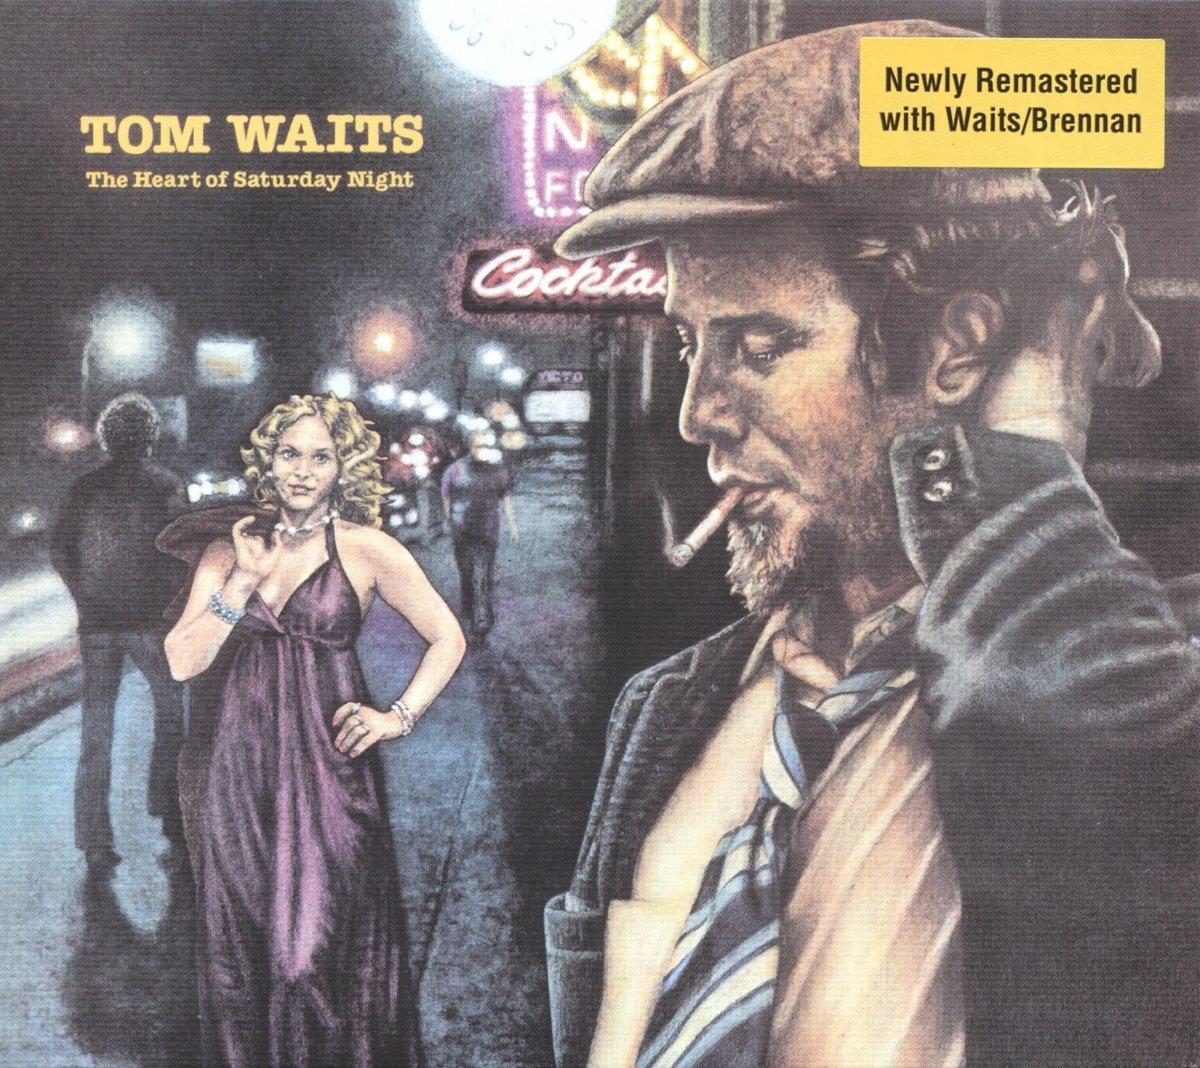 Tom Waits - The Heart Of Saturday Night (Remastered)